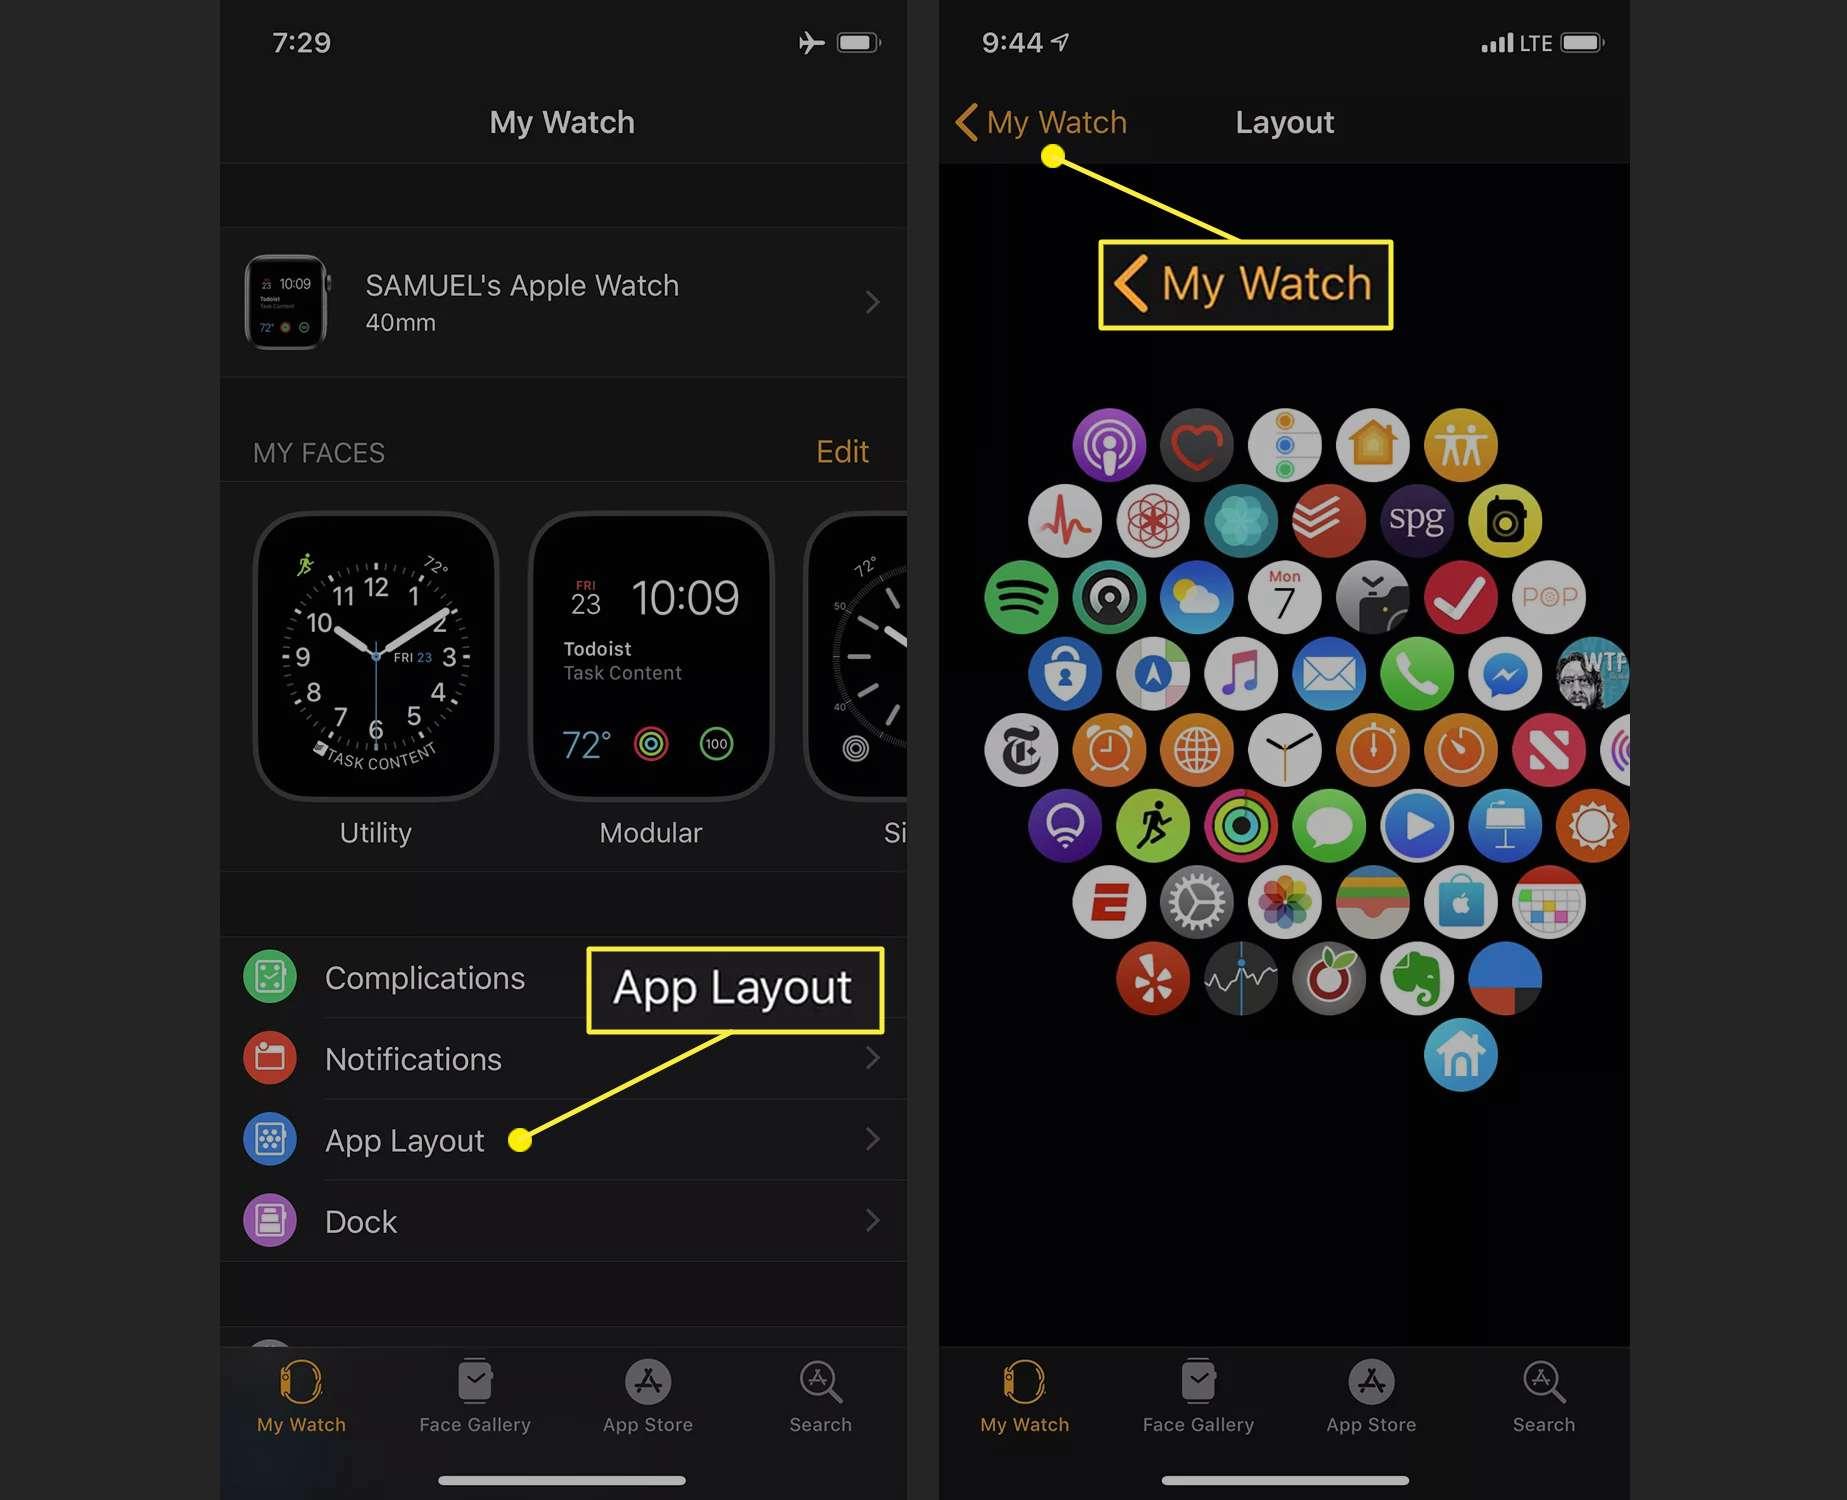 Watch app on iPhone showing watch app grid